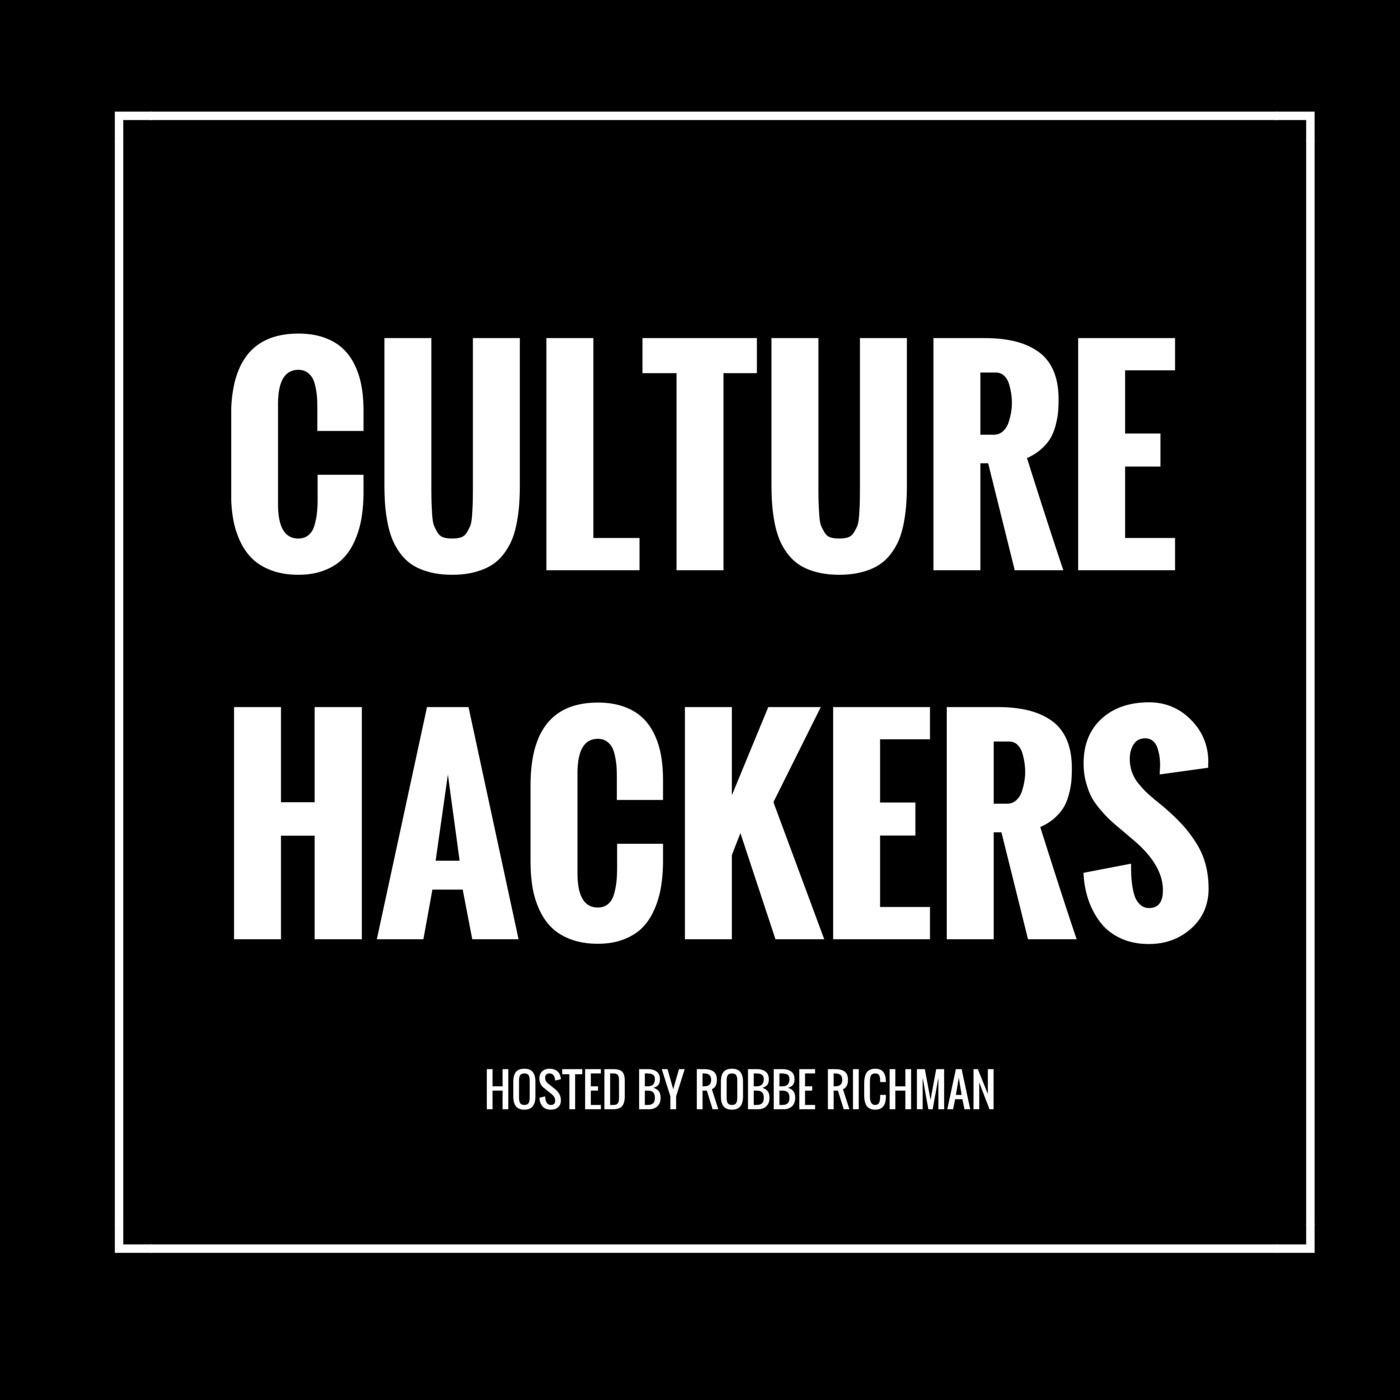 Culture Hackers